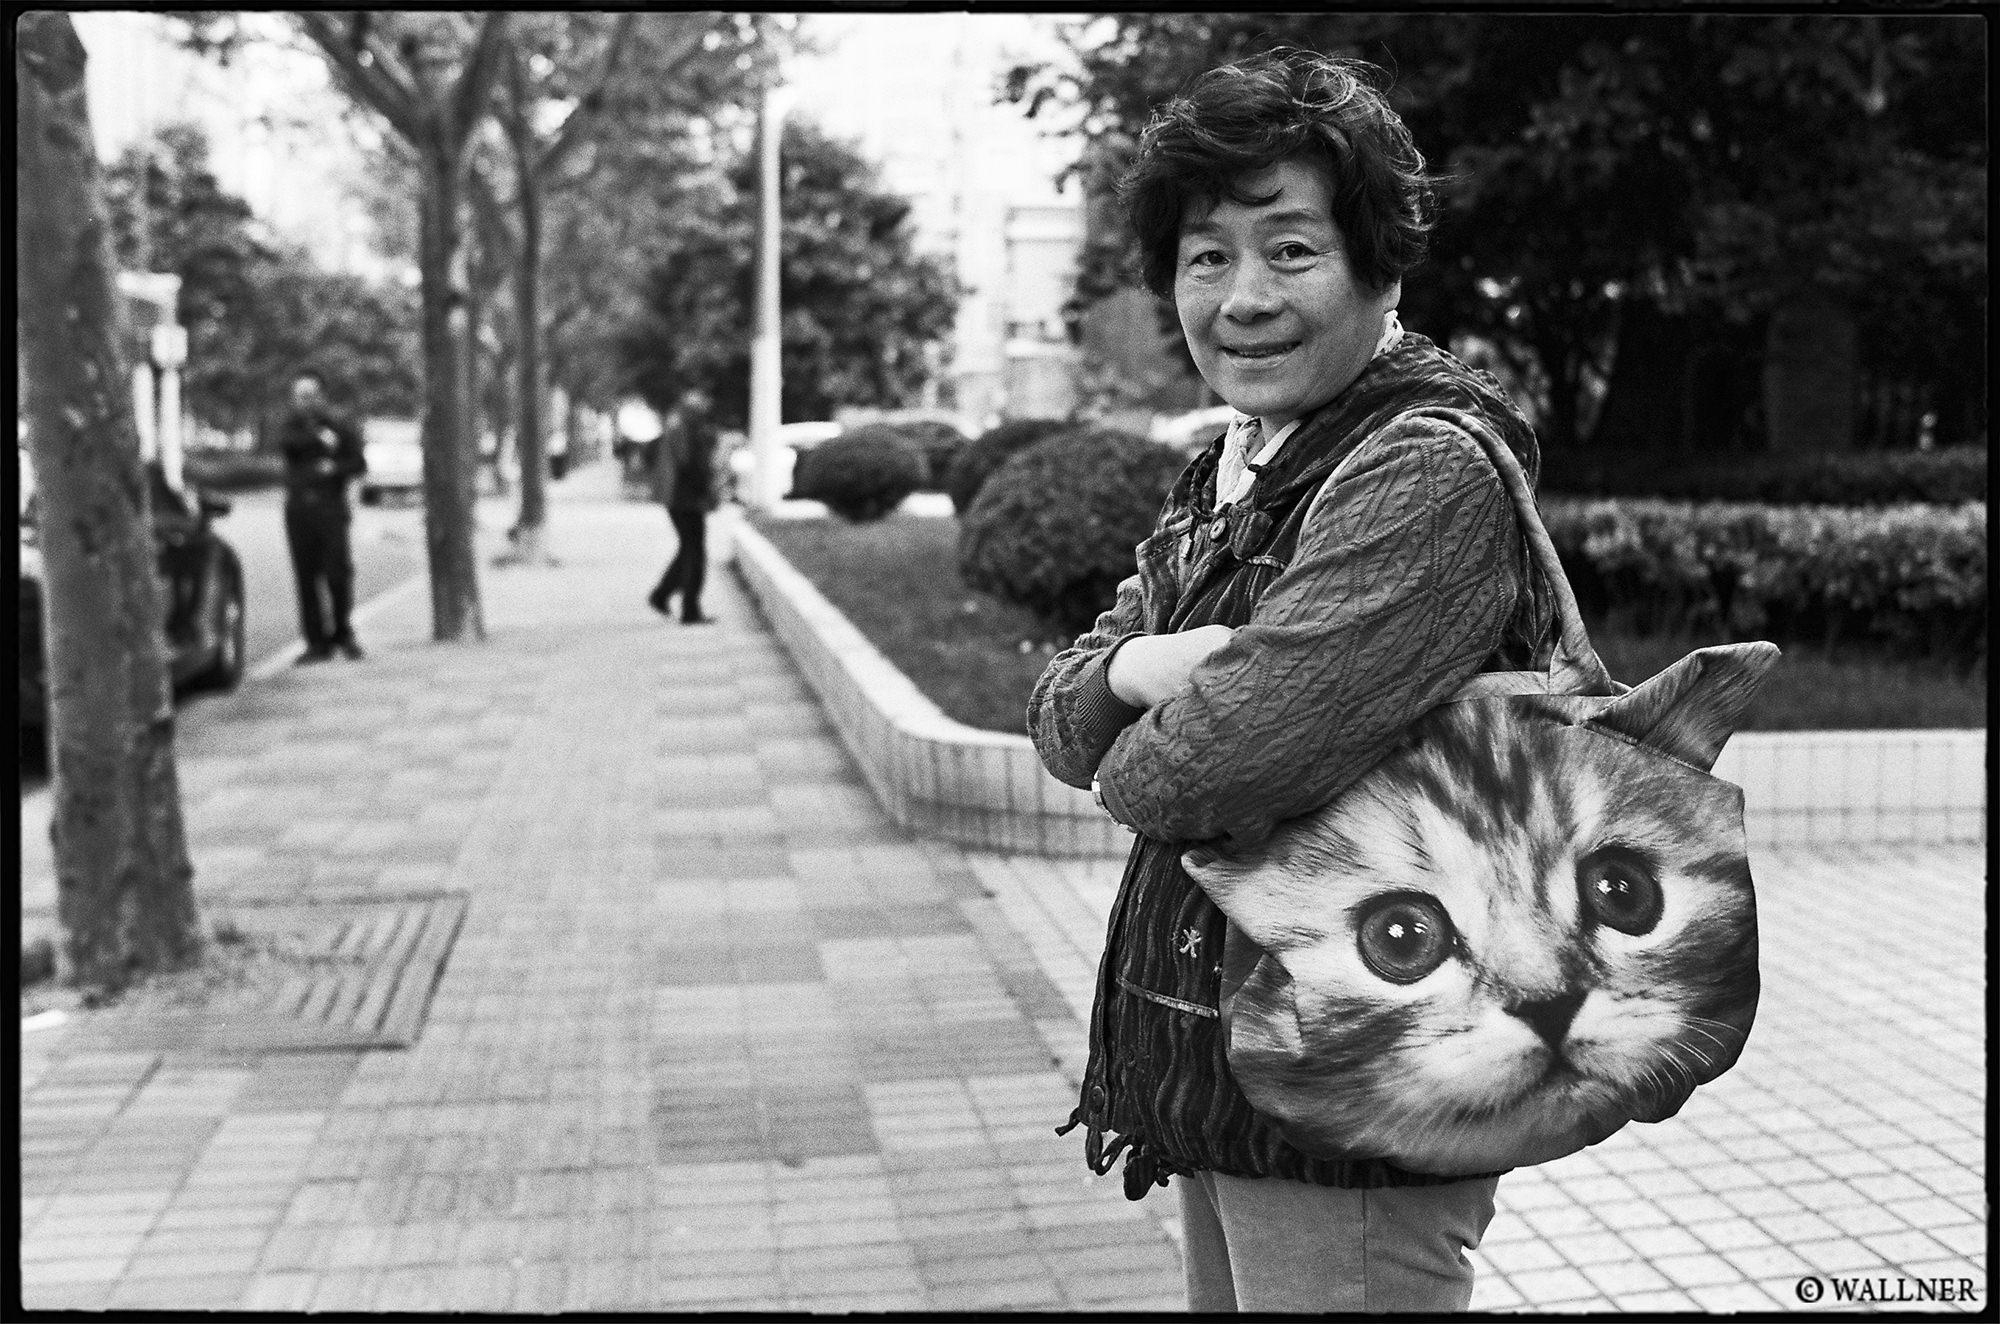 35mmPatrikWallner_Shanghai_CatBagLady LOWQ 2000P